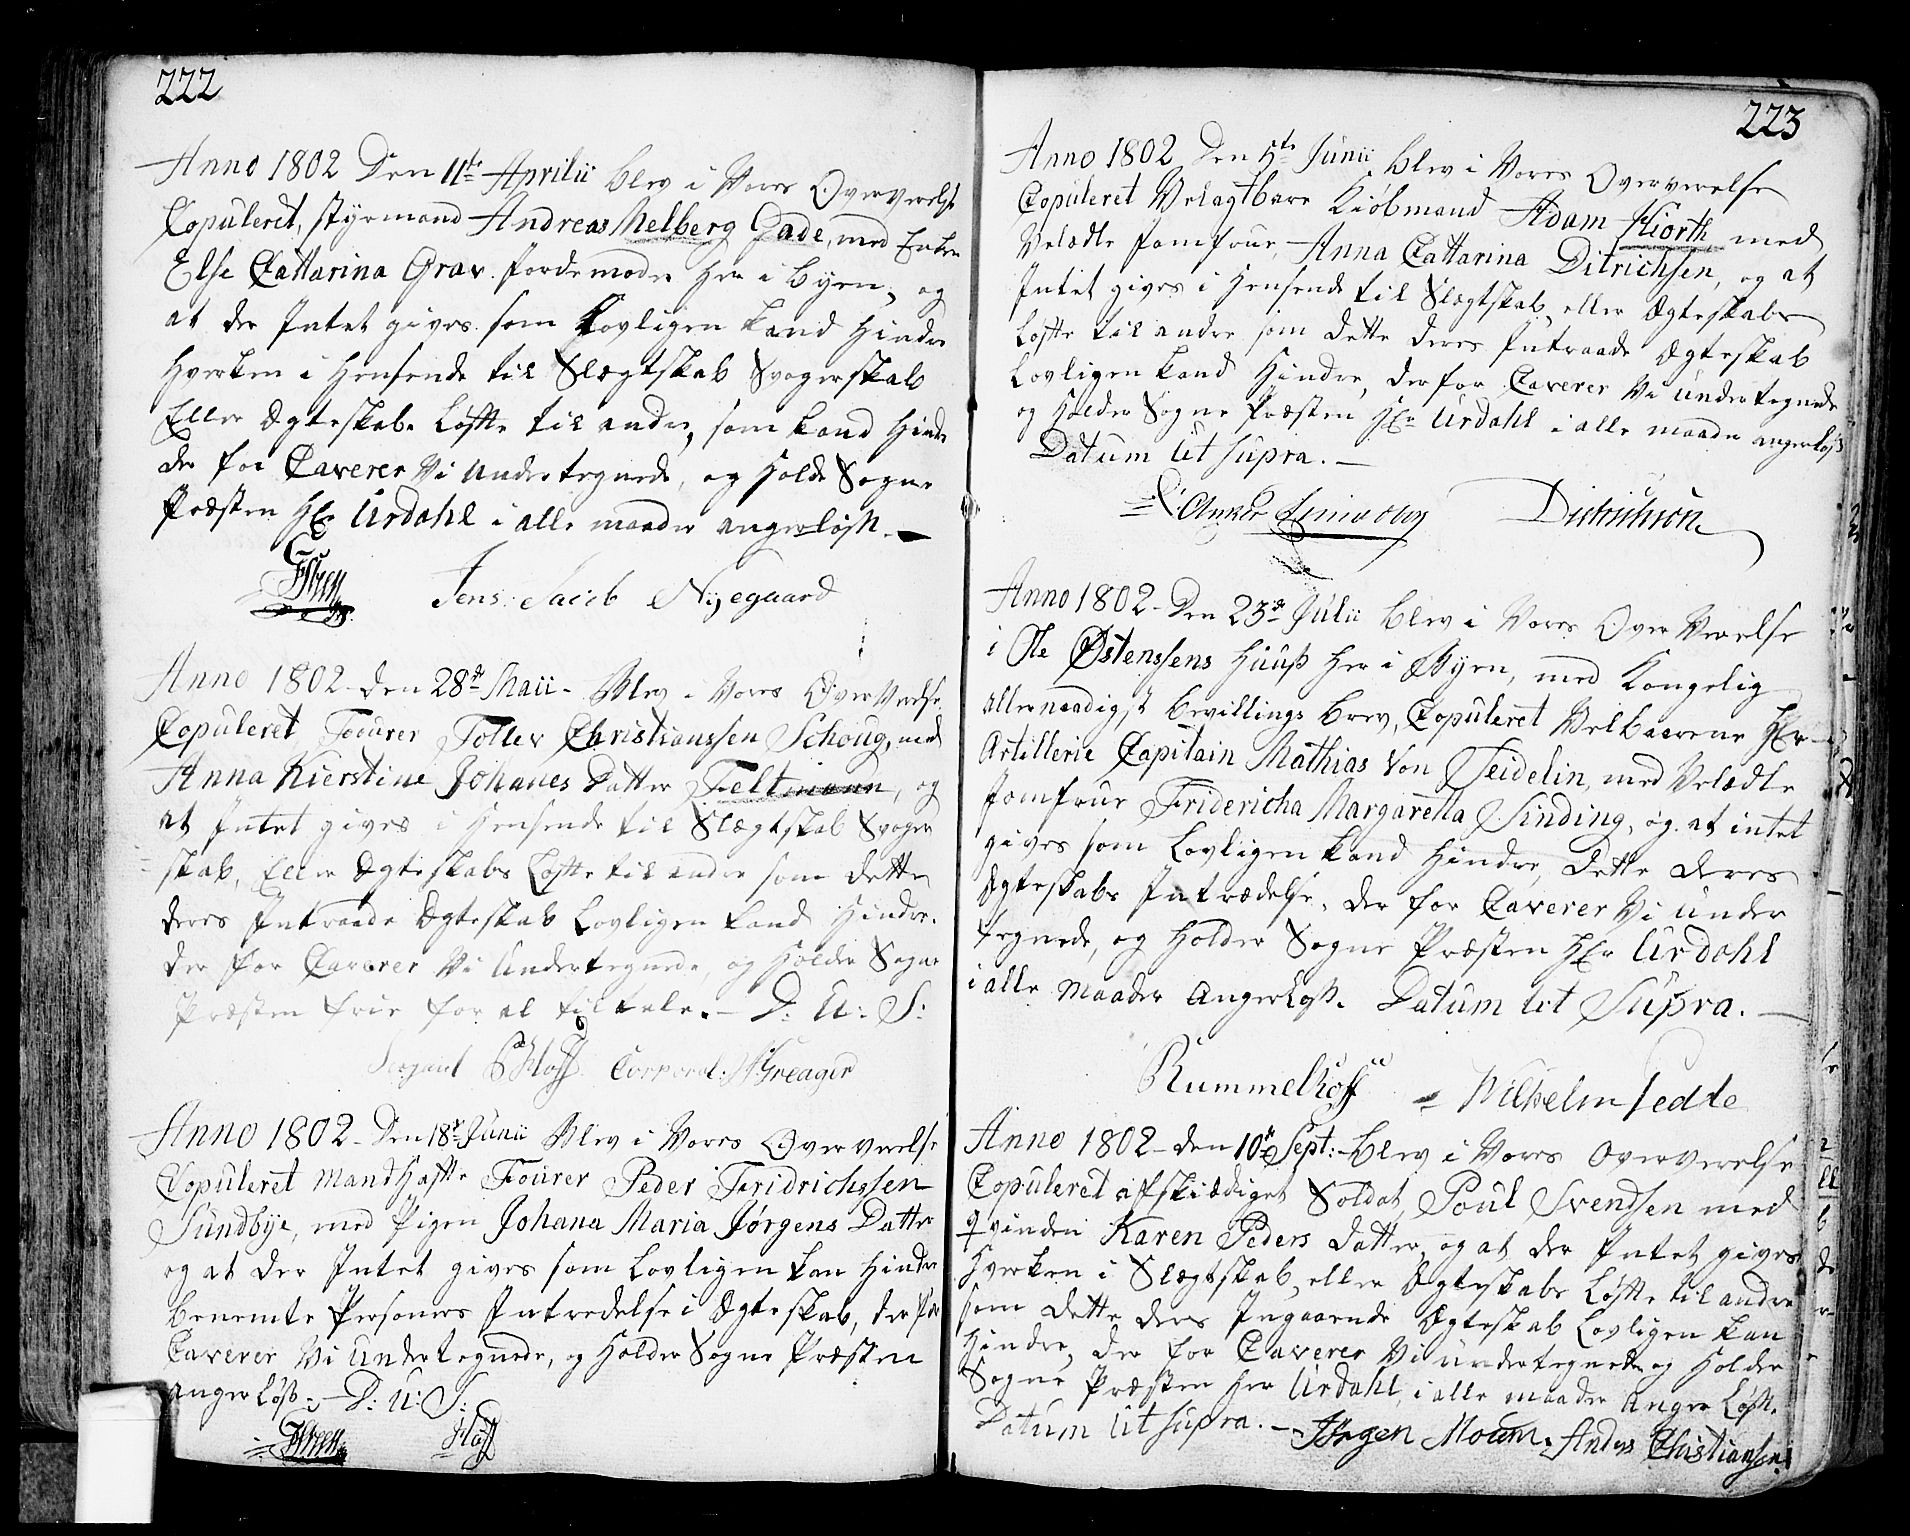 SAO, Fredrikstad prestekontor Kirkebøker, F/Fa/L0002: Ministerialbok nr. 2, 1750-1804, s. 222-223